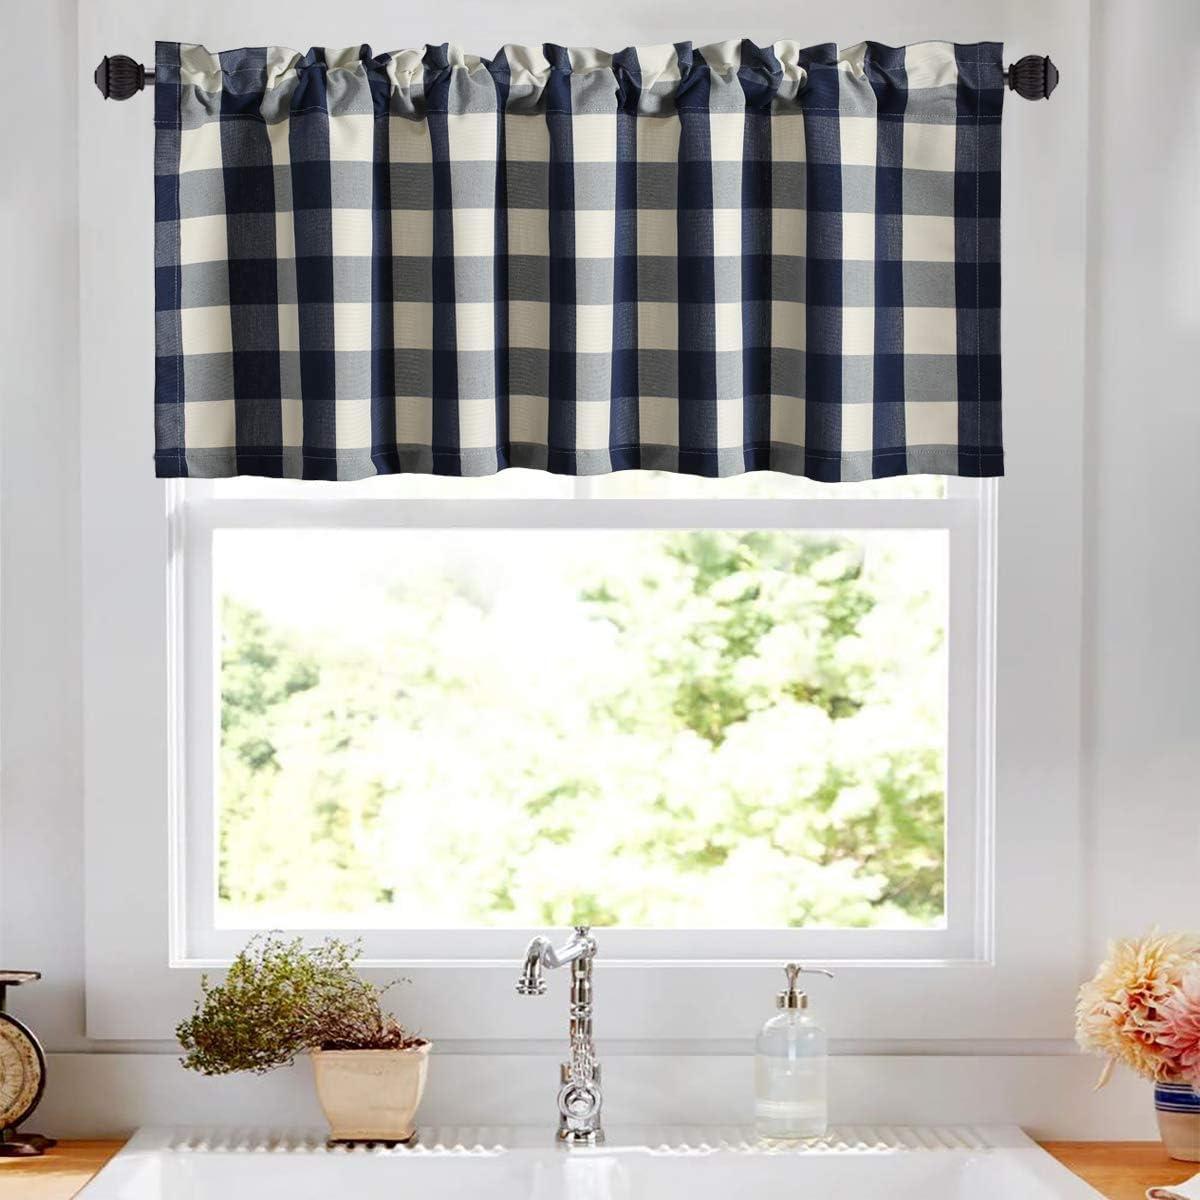 VOGOL Buffalo Check Plaid Cotton Valances for Windows, Blue and White Farmhouse Design Window Treatment Decor Curtains, Rod Pocket Valances for Cafe, 52''x18'', Navy